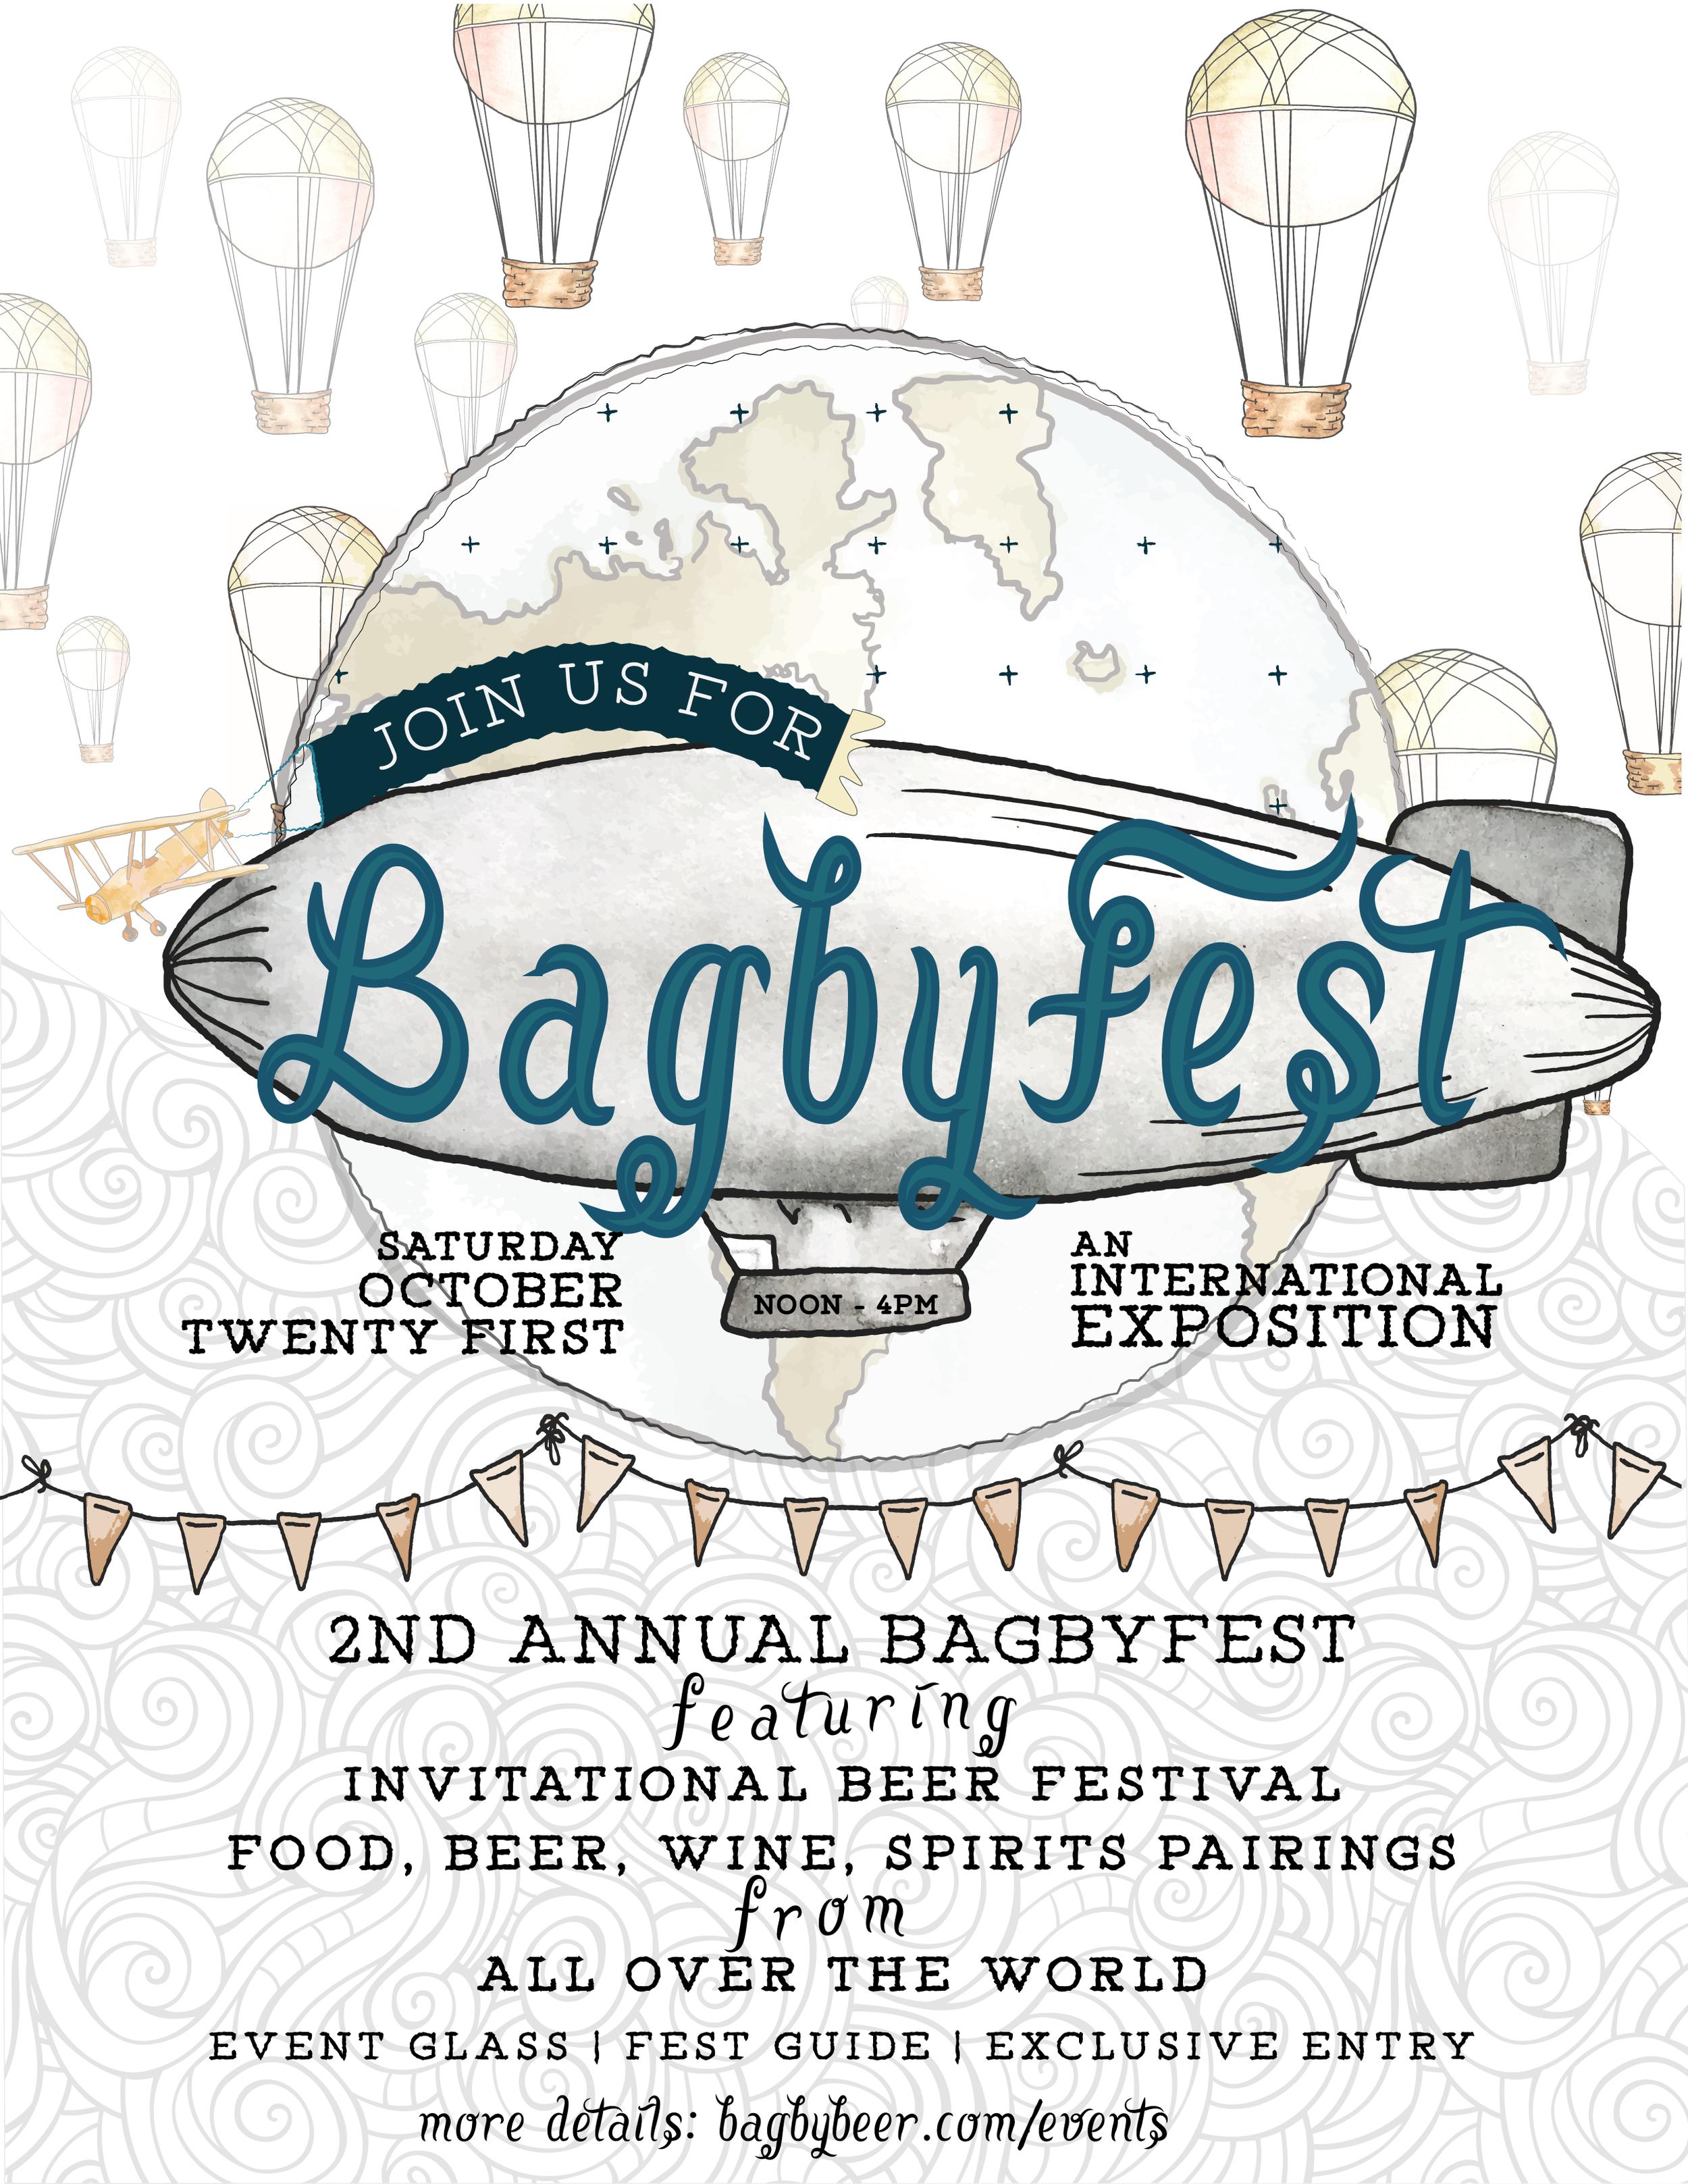 bagbyfest trial-01.png